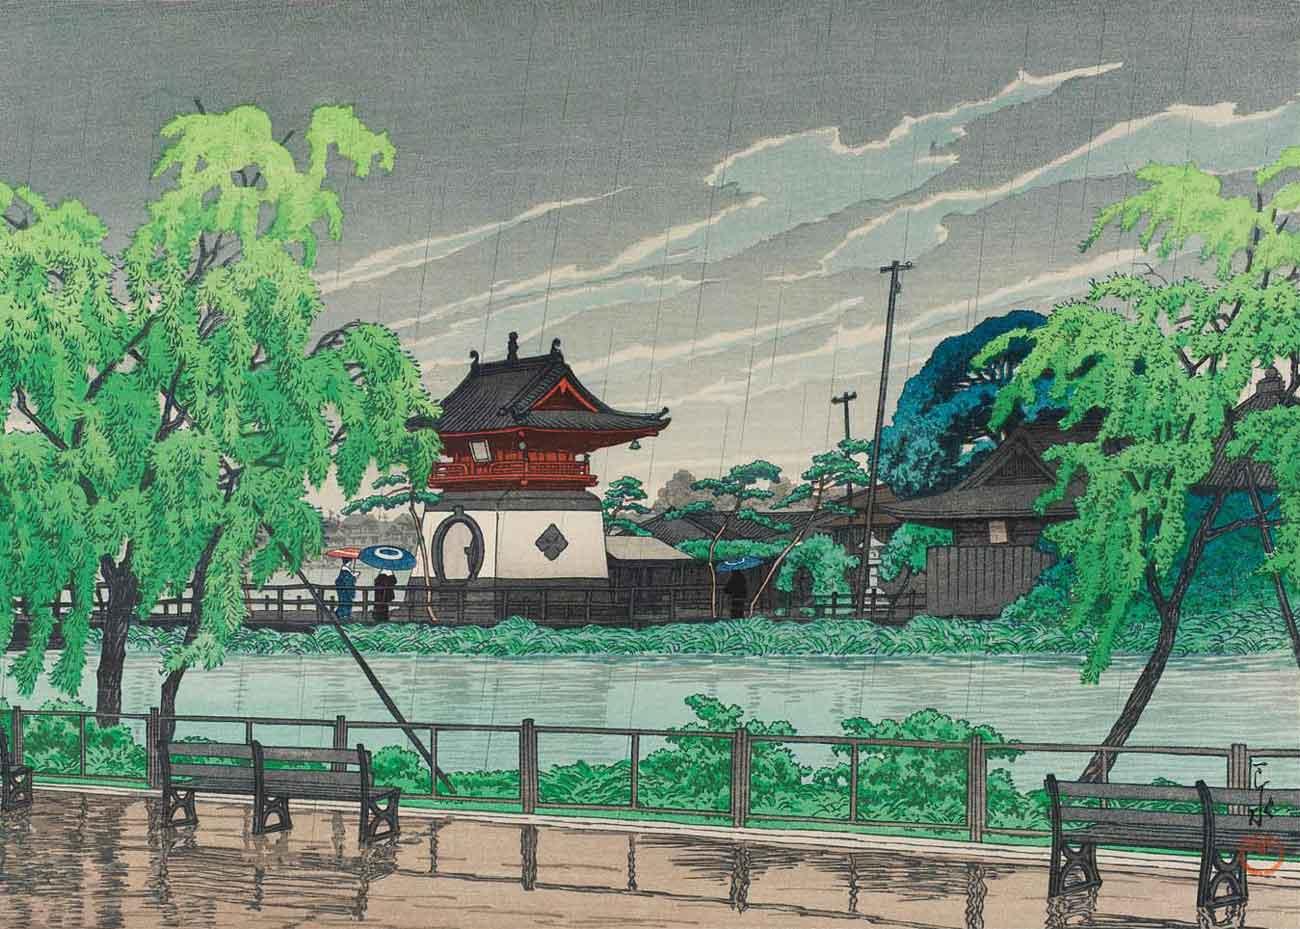 © Kawase Hasui, Shinobazu Pond in Rain, 1926 Woodblock Print, from the  Museum of Fine Arts, Boston .